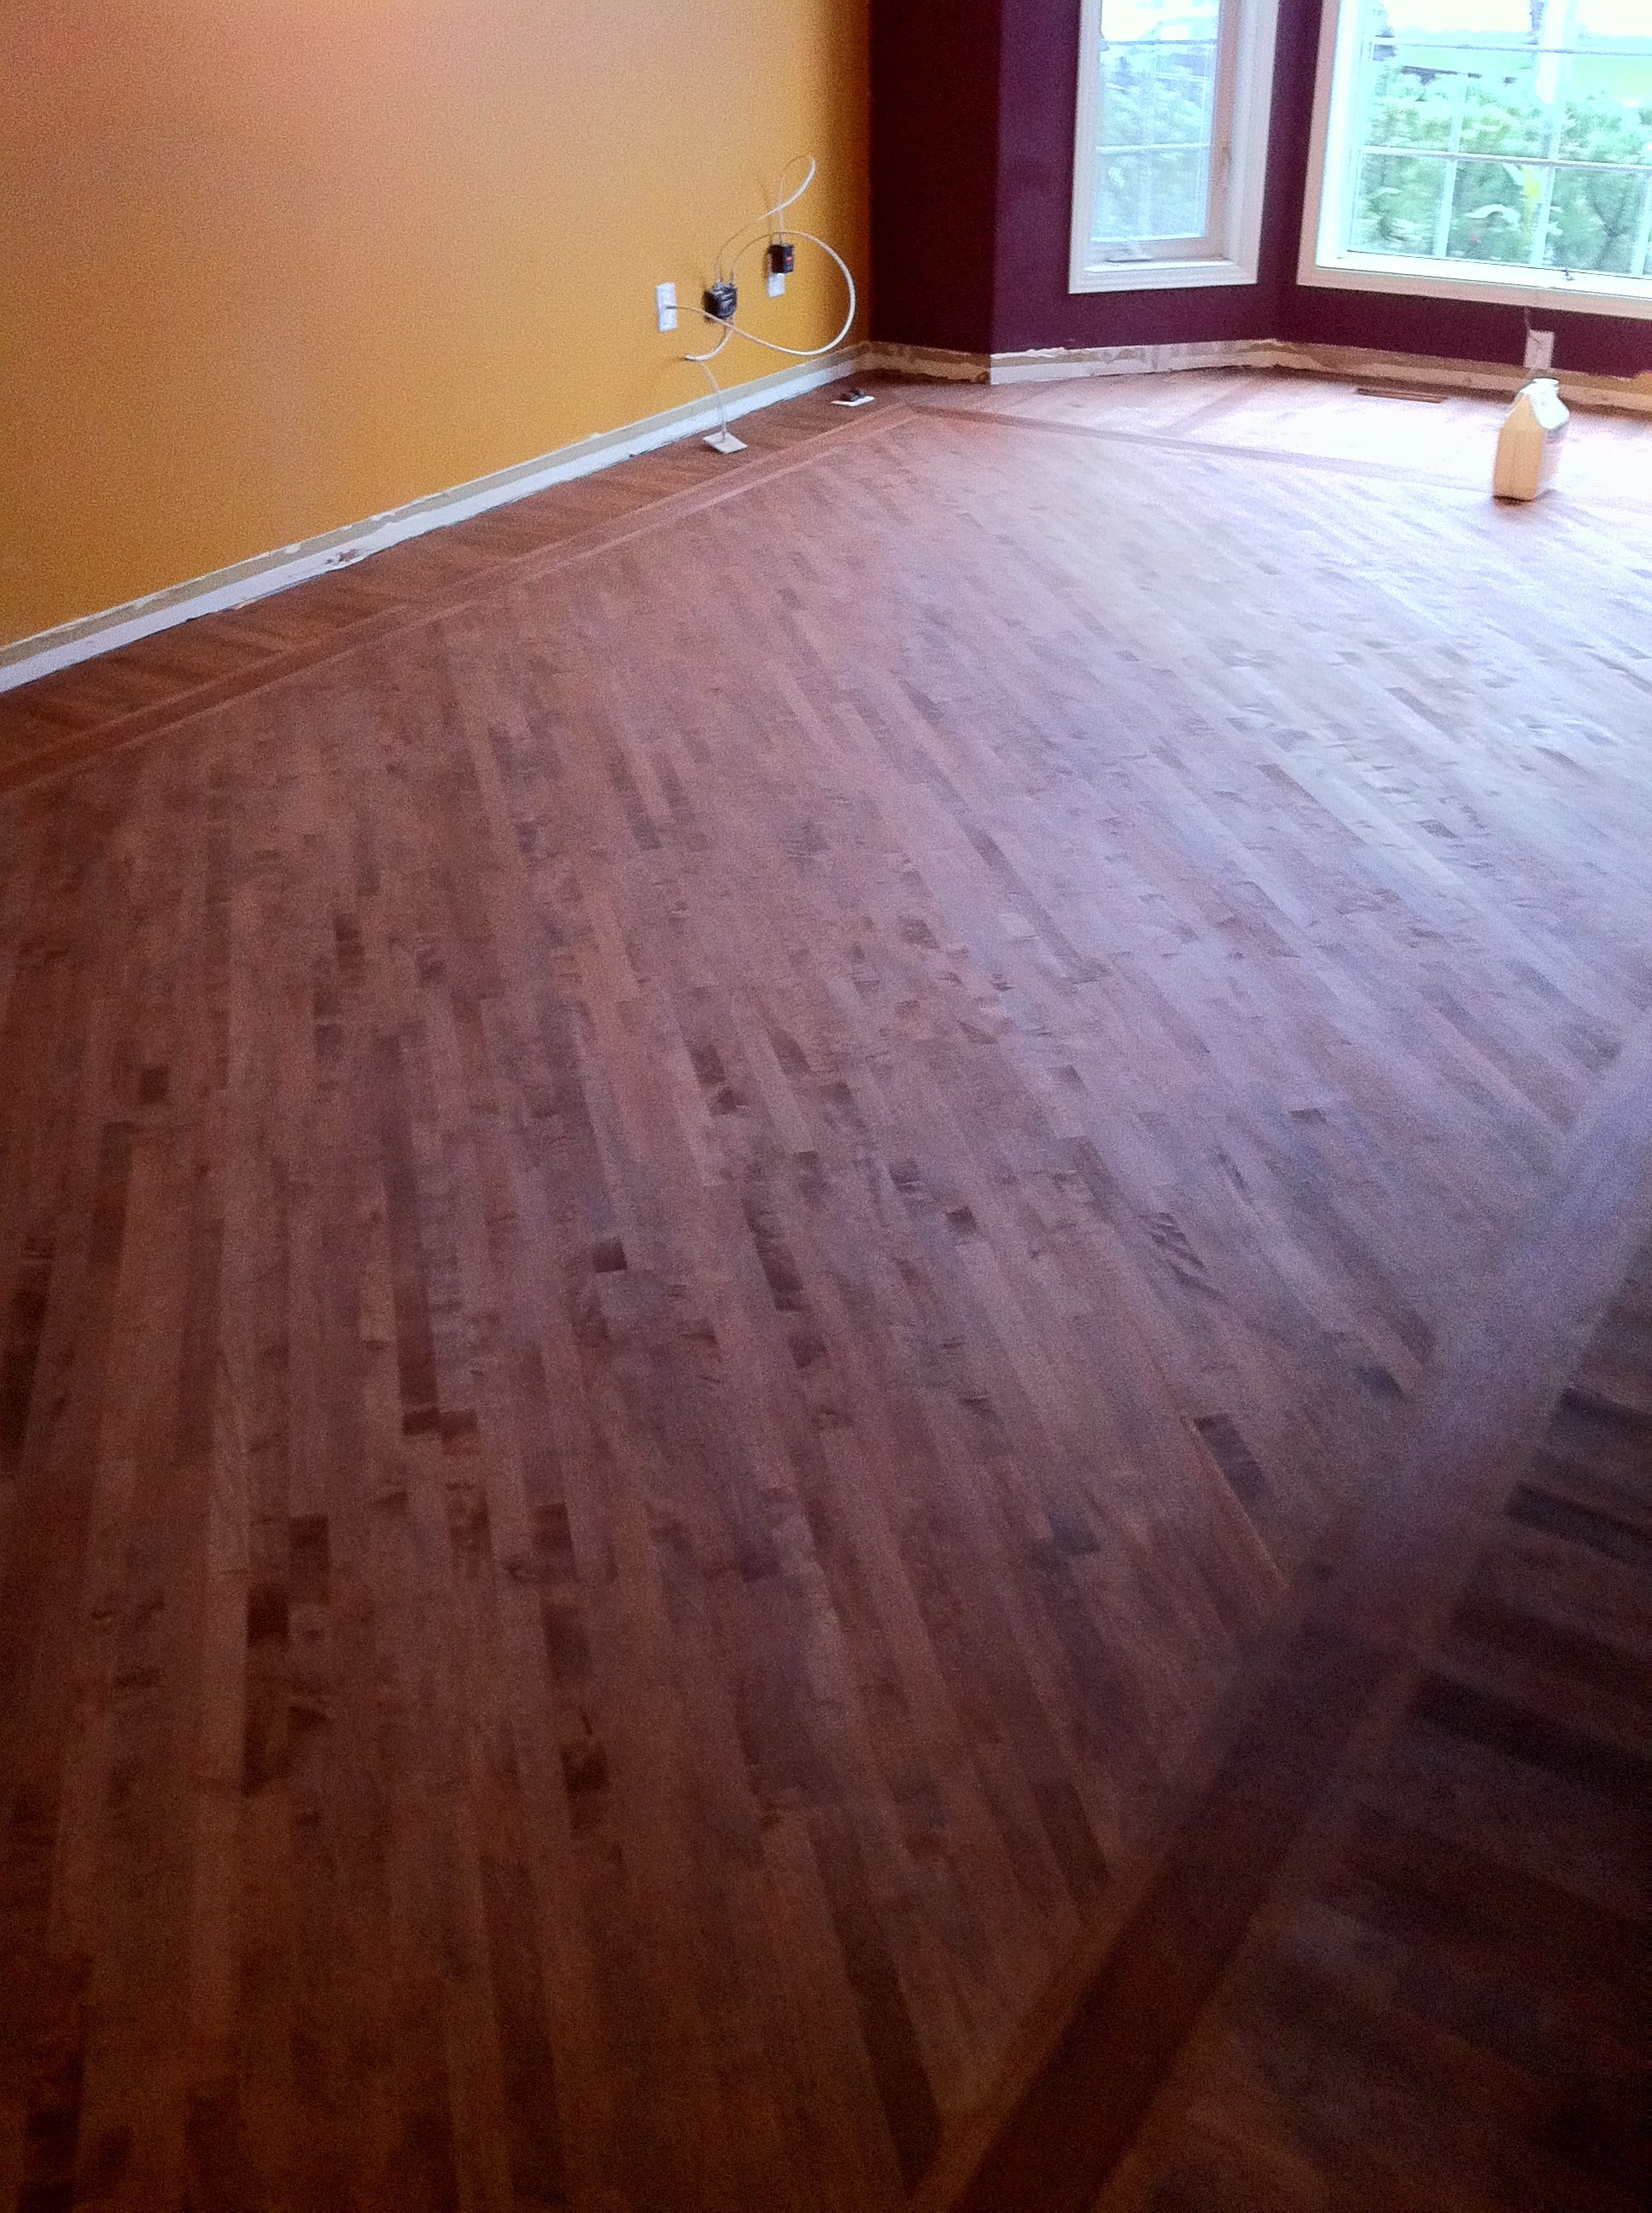 About Hardwood Flooring Hardwood, Hardwood floors